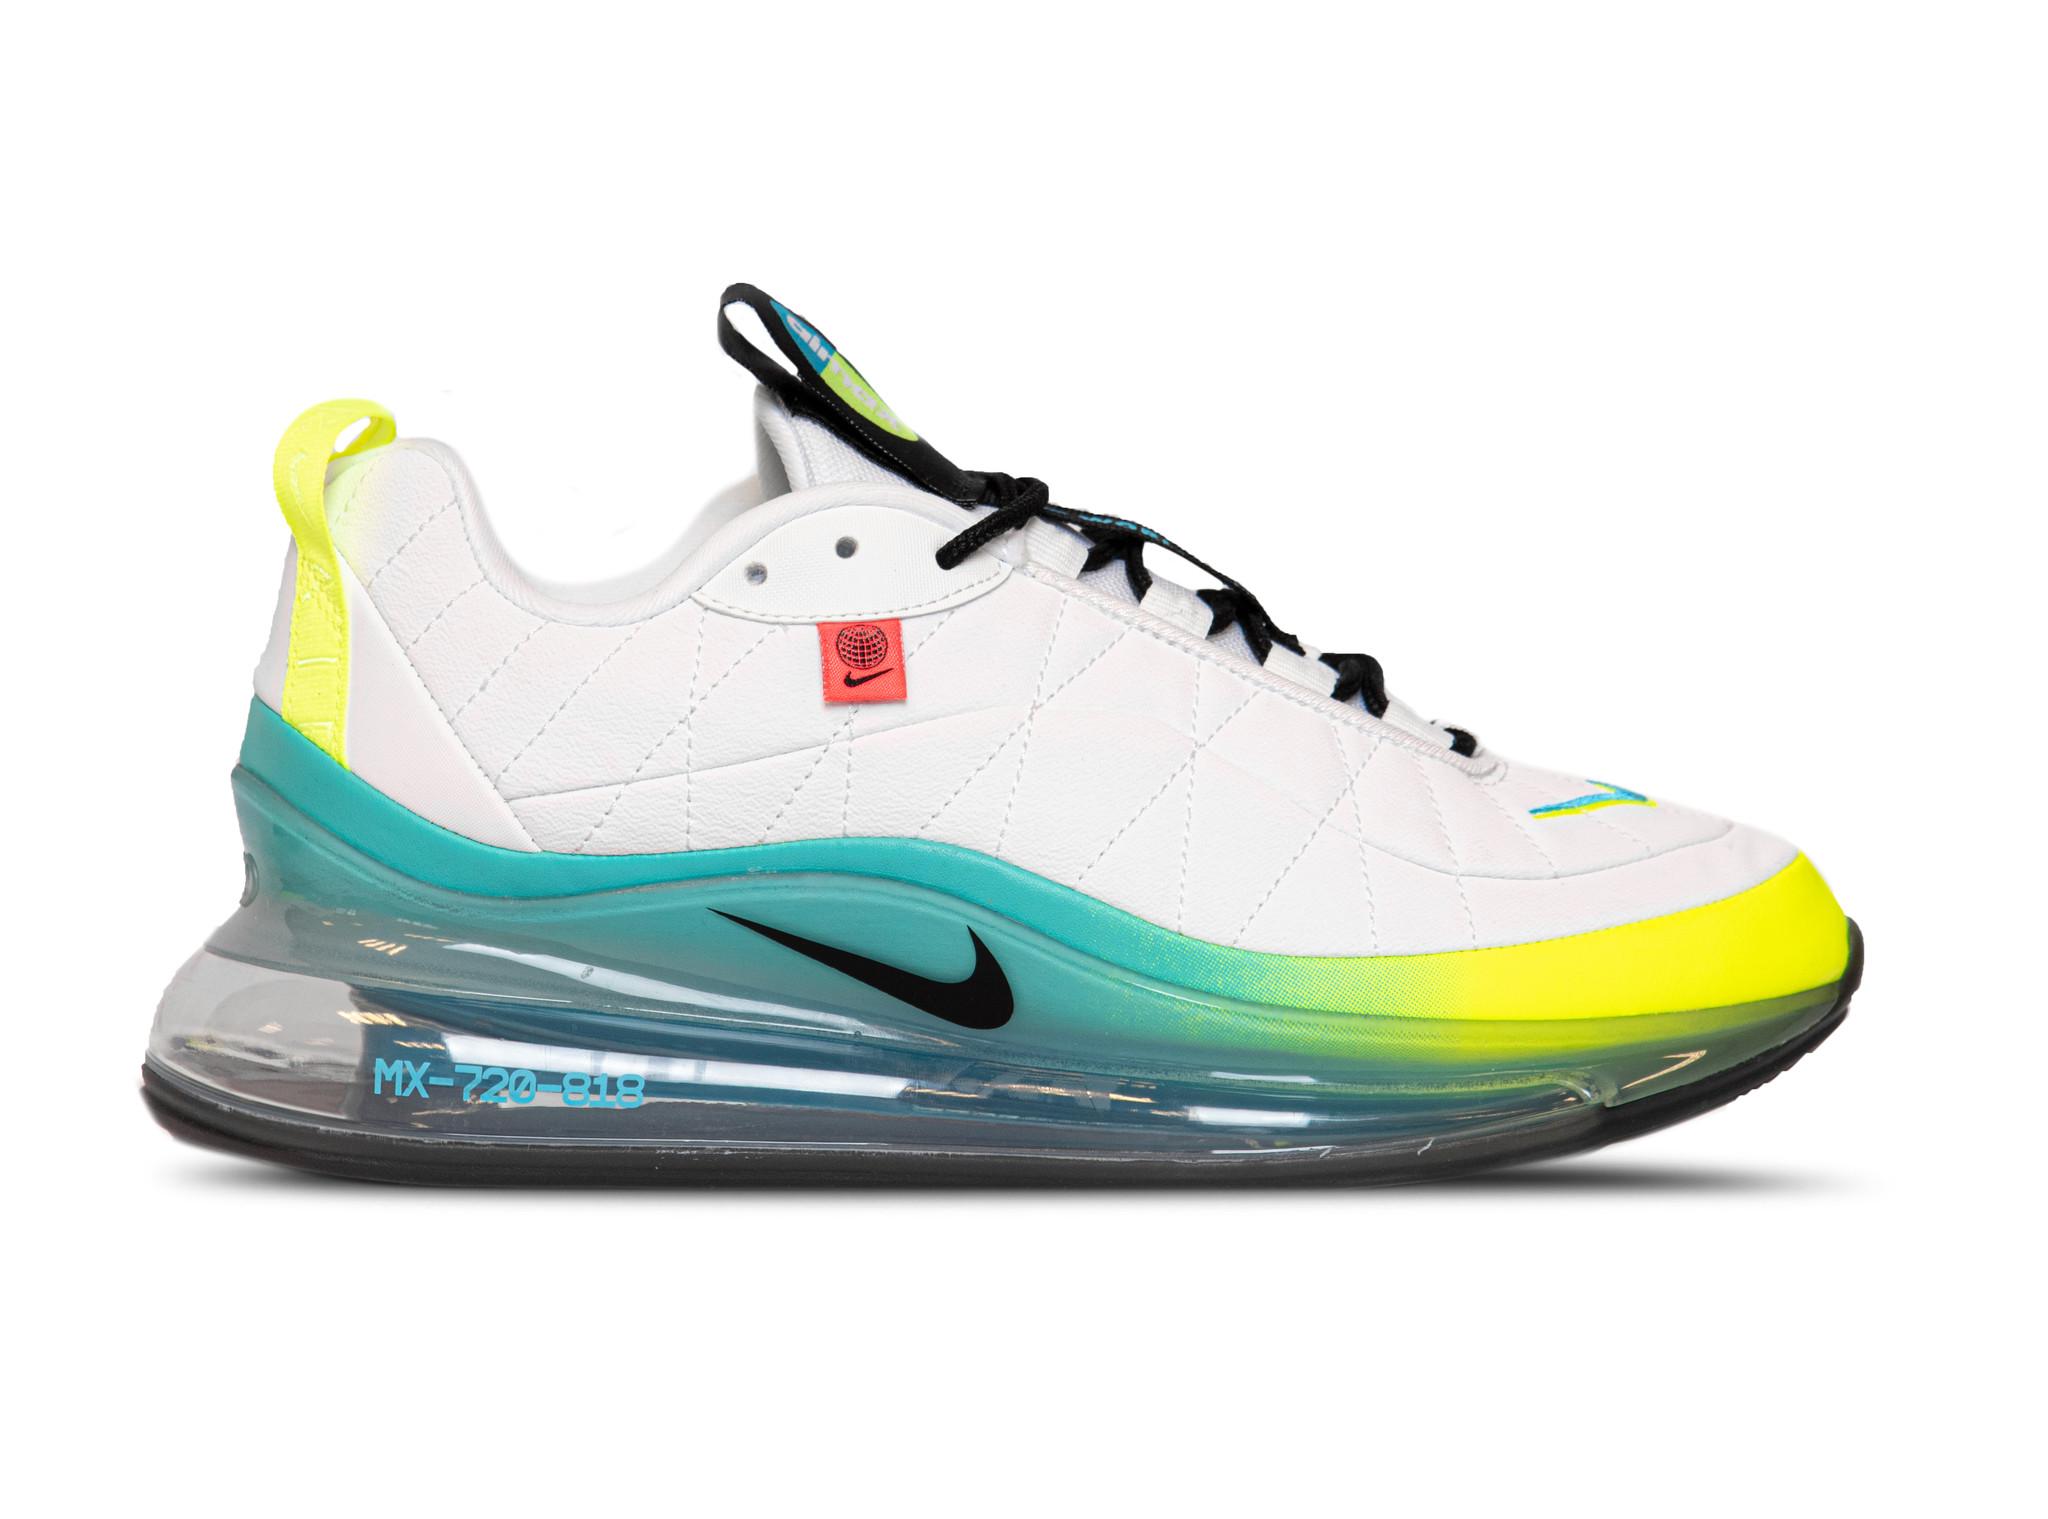 Nike MX 720 818 Worldwide White Black Blue Fury Volt CT1282 100